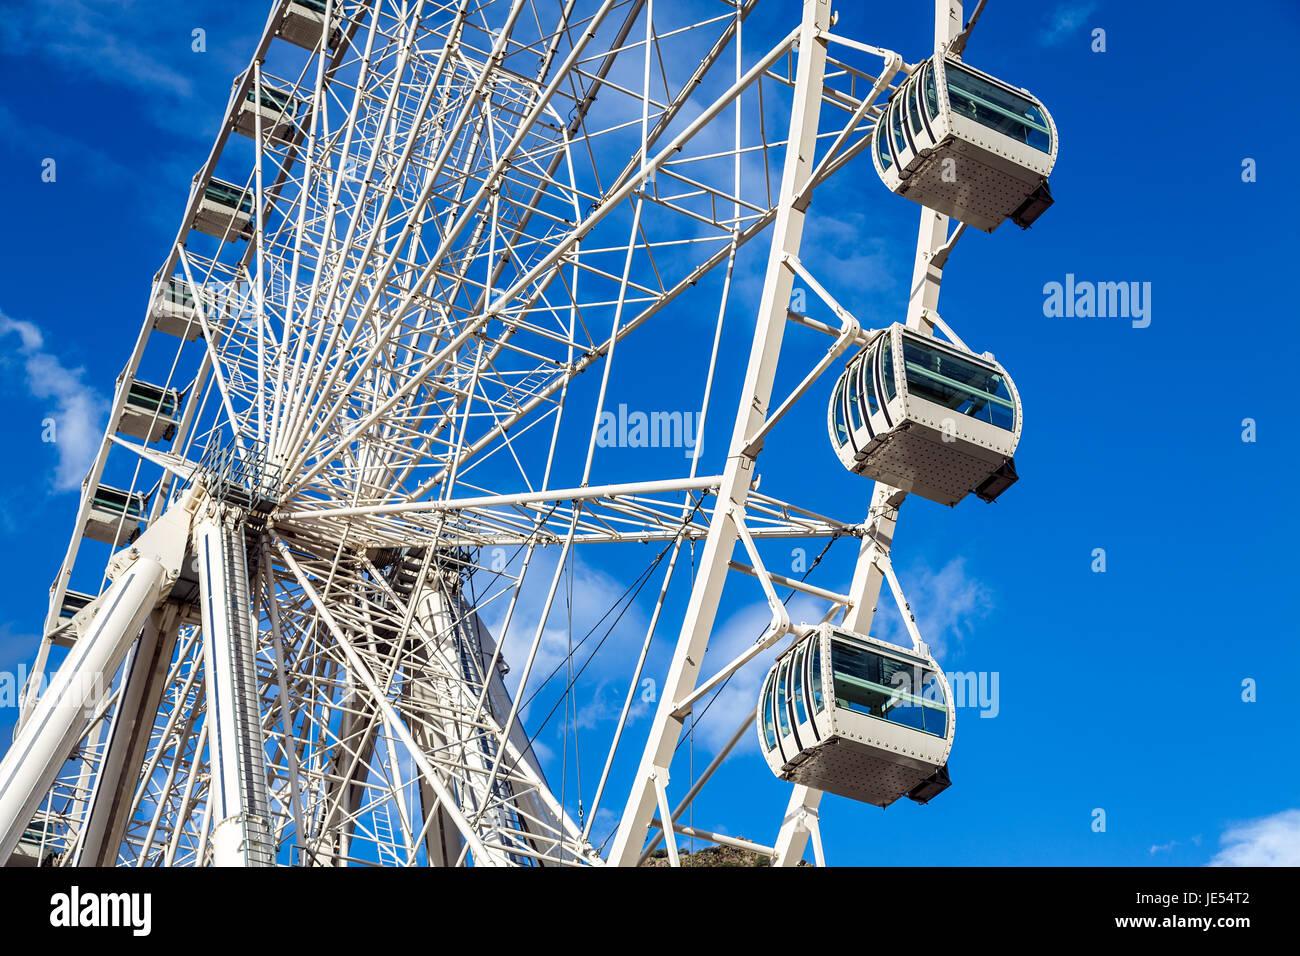 Ferris Wheel at Andorra la Vella, Andorra Stock Photo